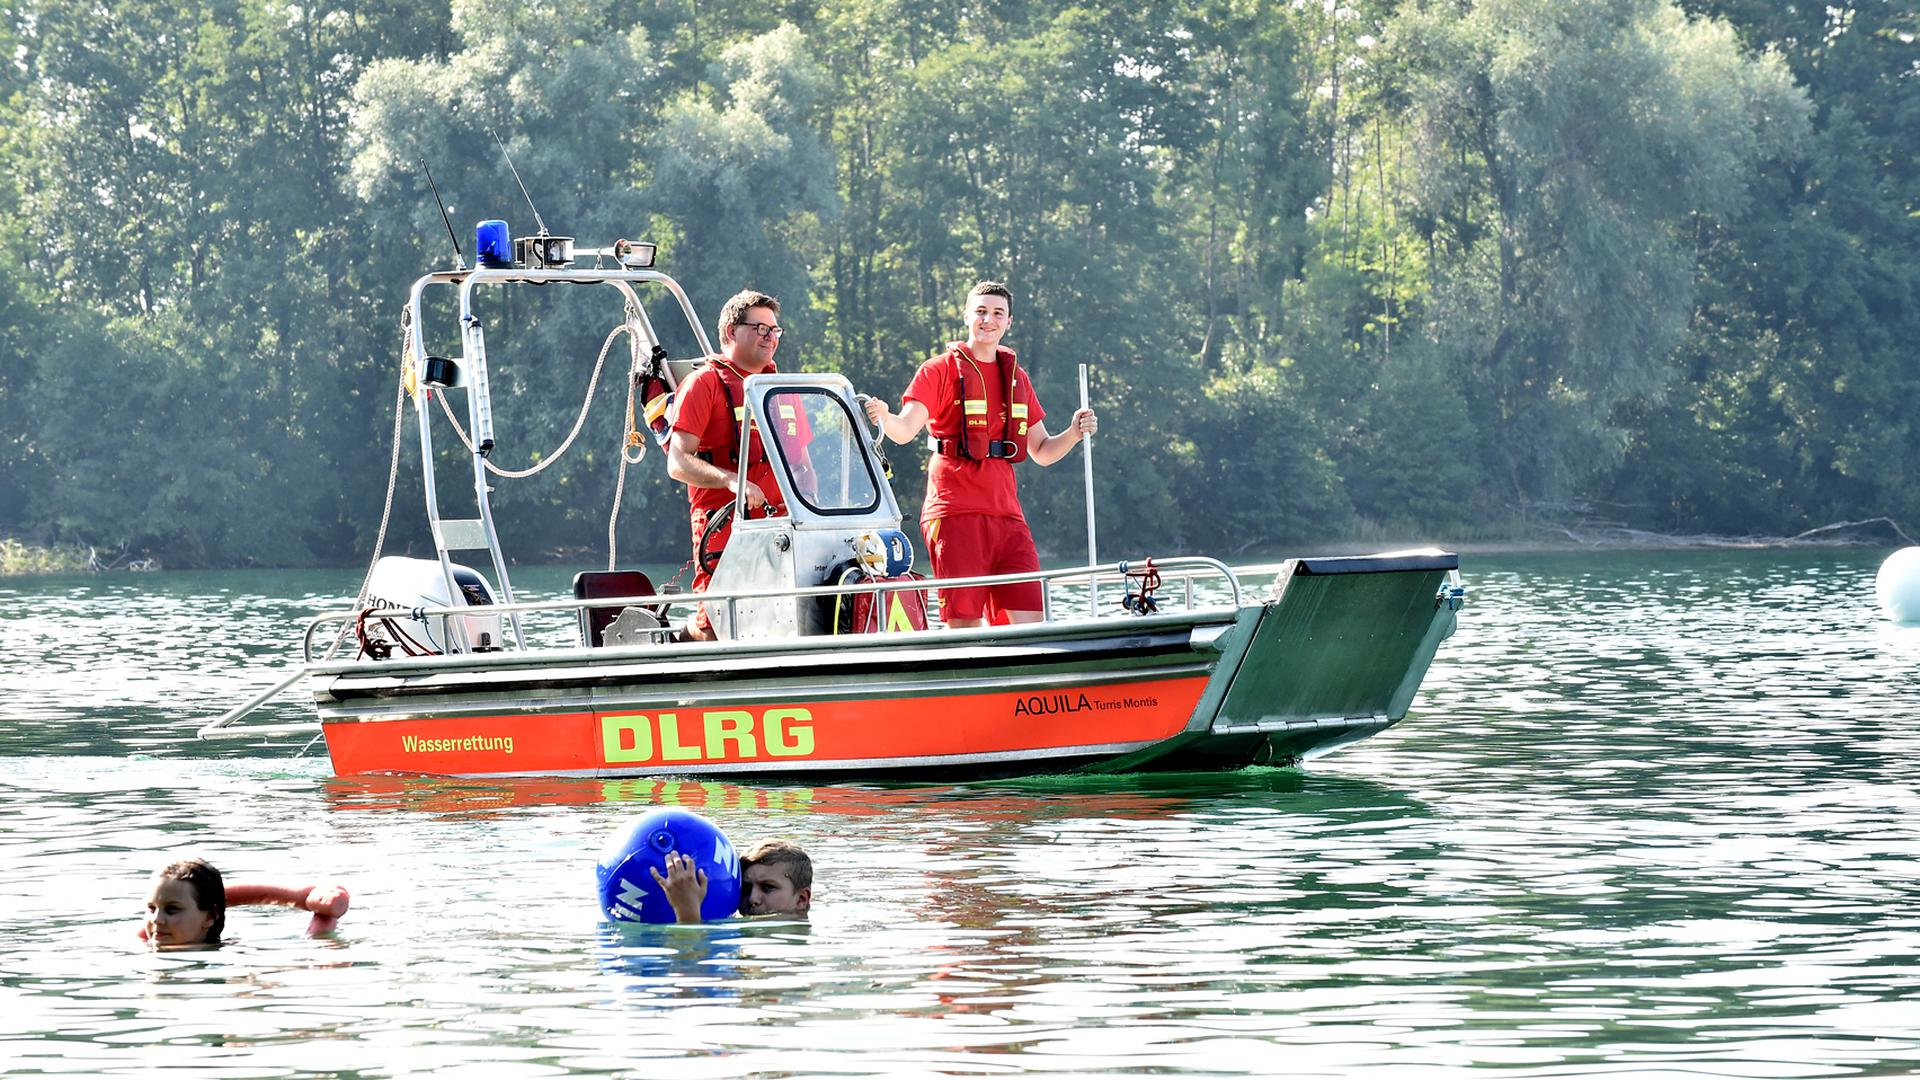 25.08.2019 Die DLRG Ortsgruppe Durlach am Grötzinger Baggersee